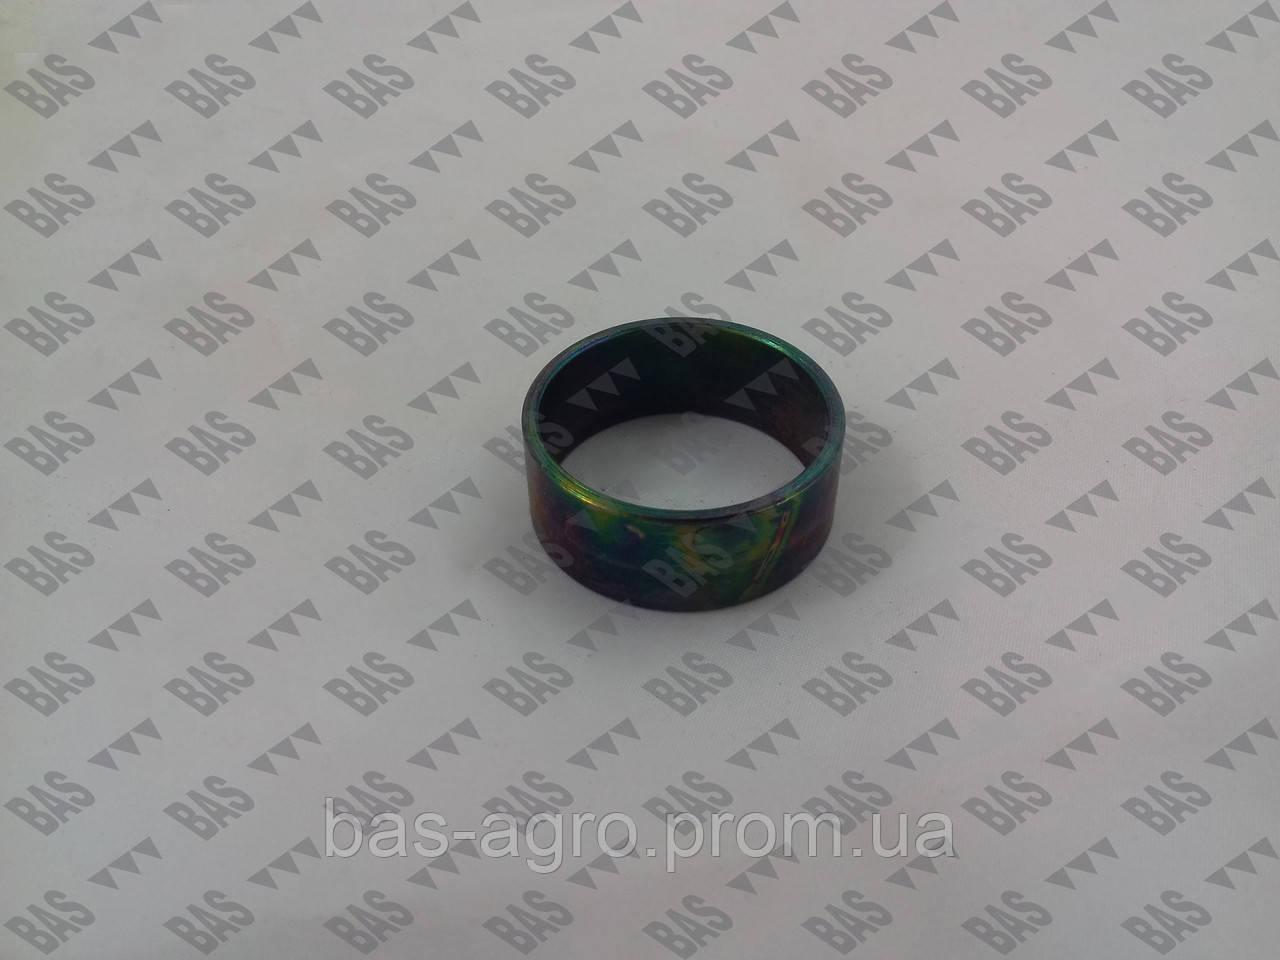 Кольцо monosem 4529 (40060101) аналог